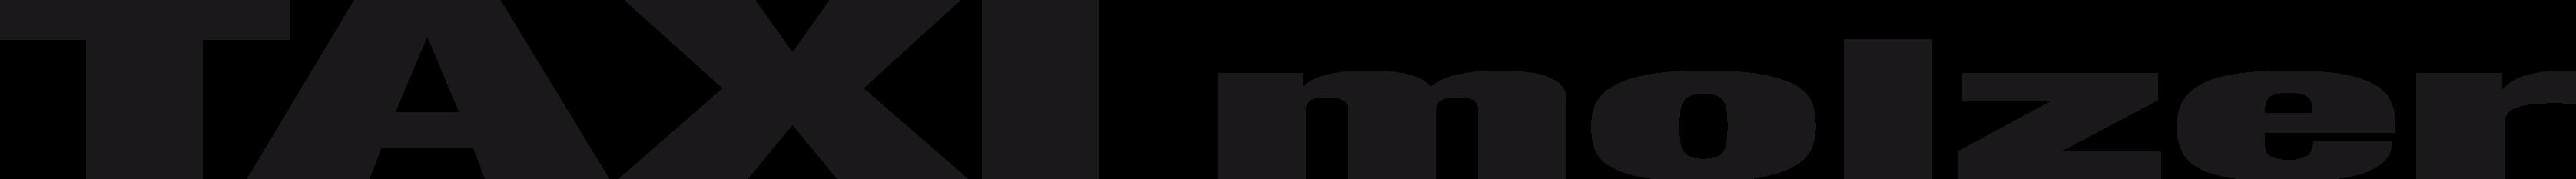 taxi korneuburg logo